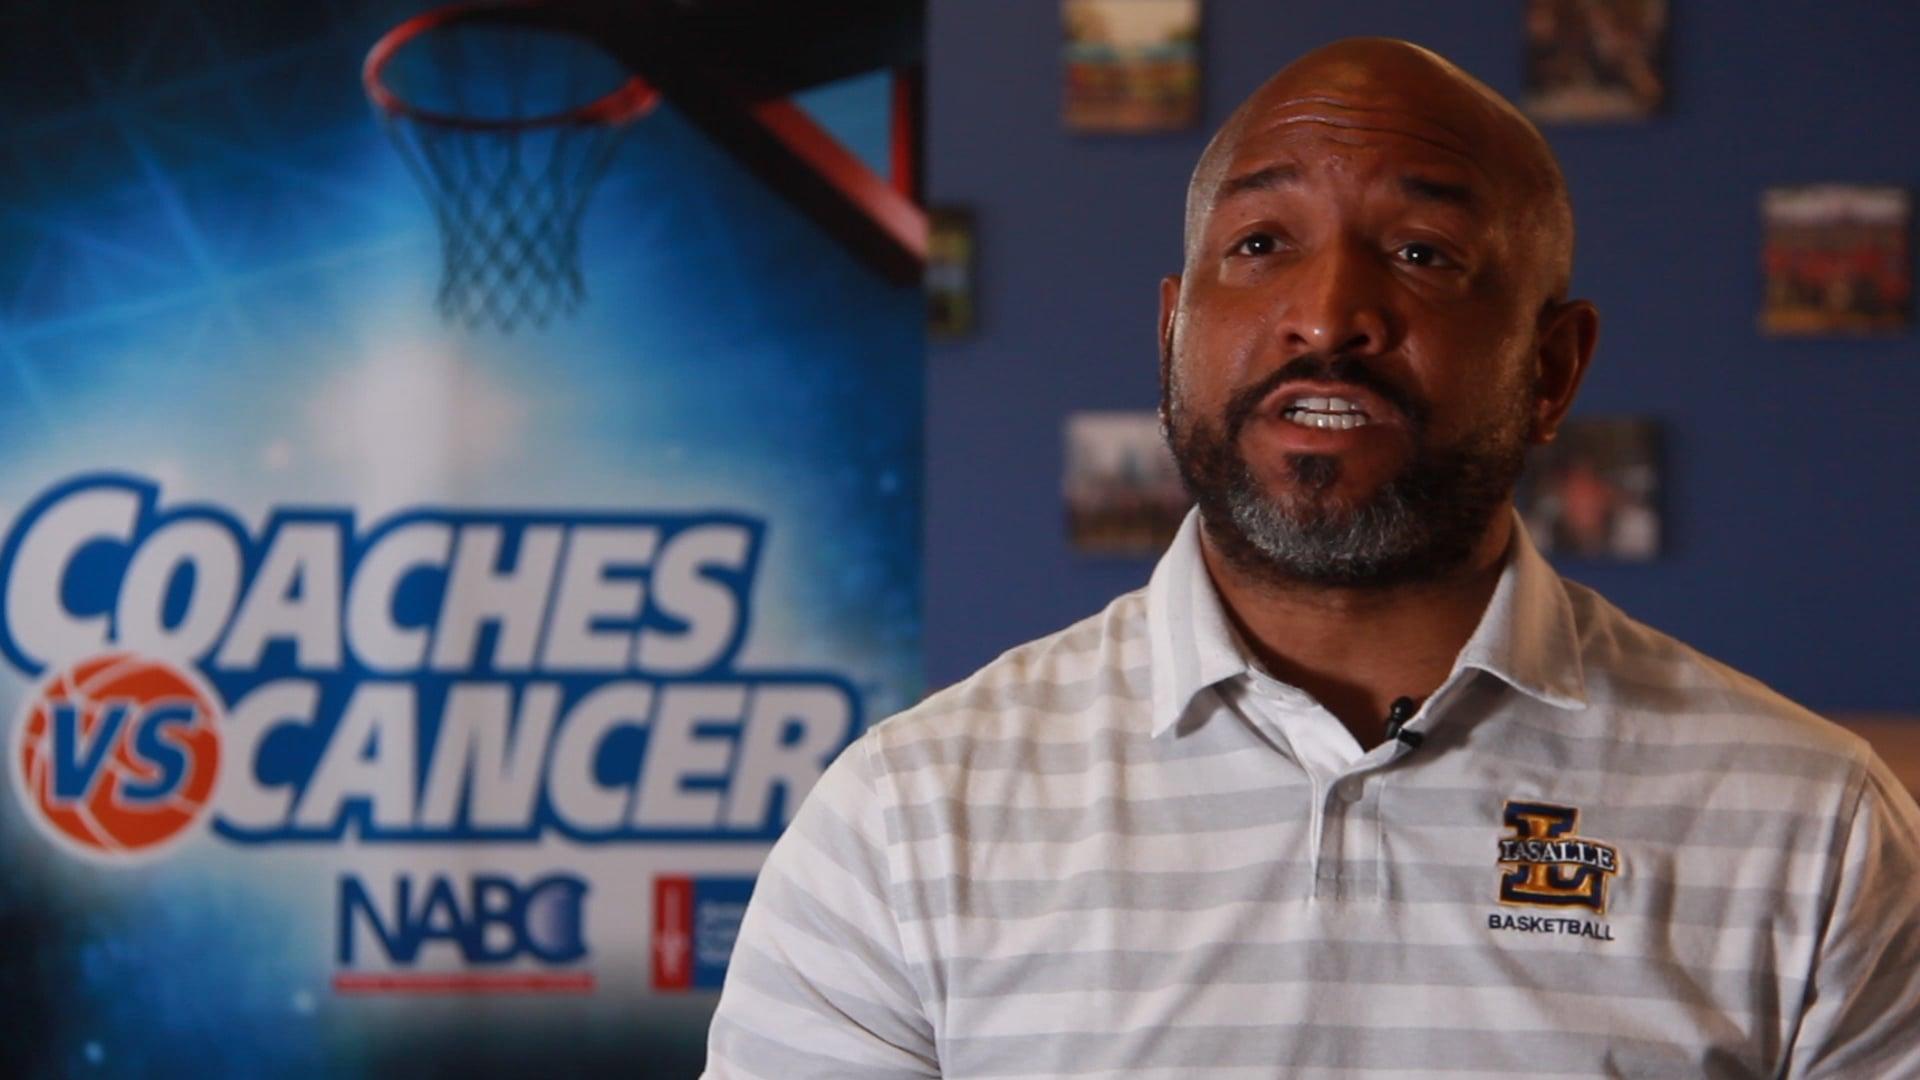 Coaches VS Cancer Off the Court Social Promo